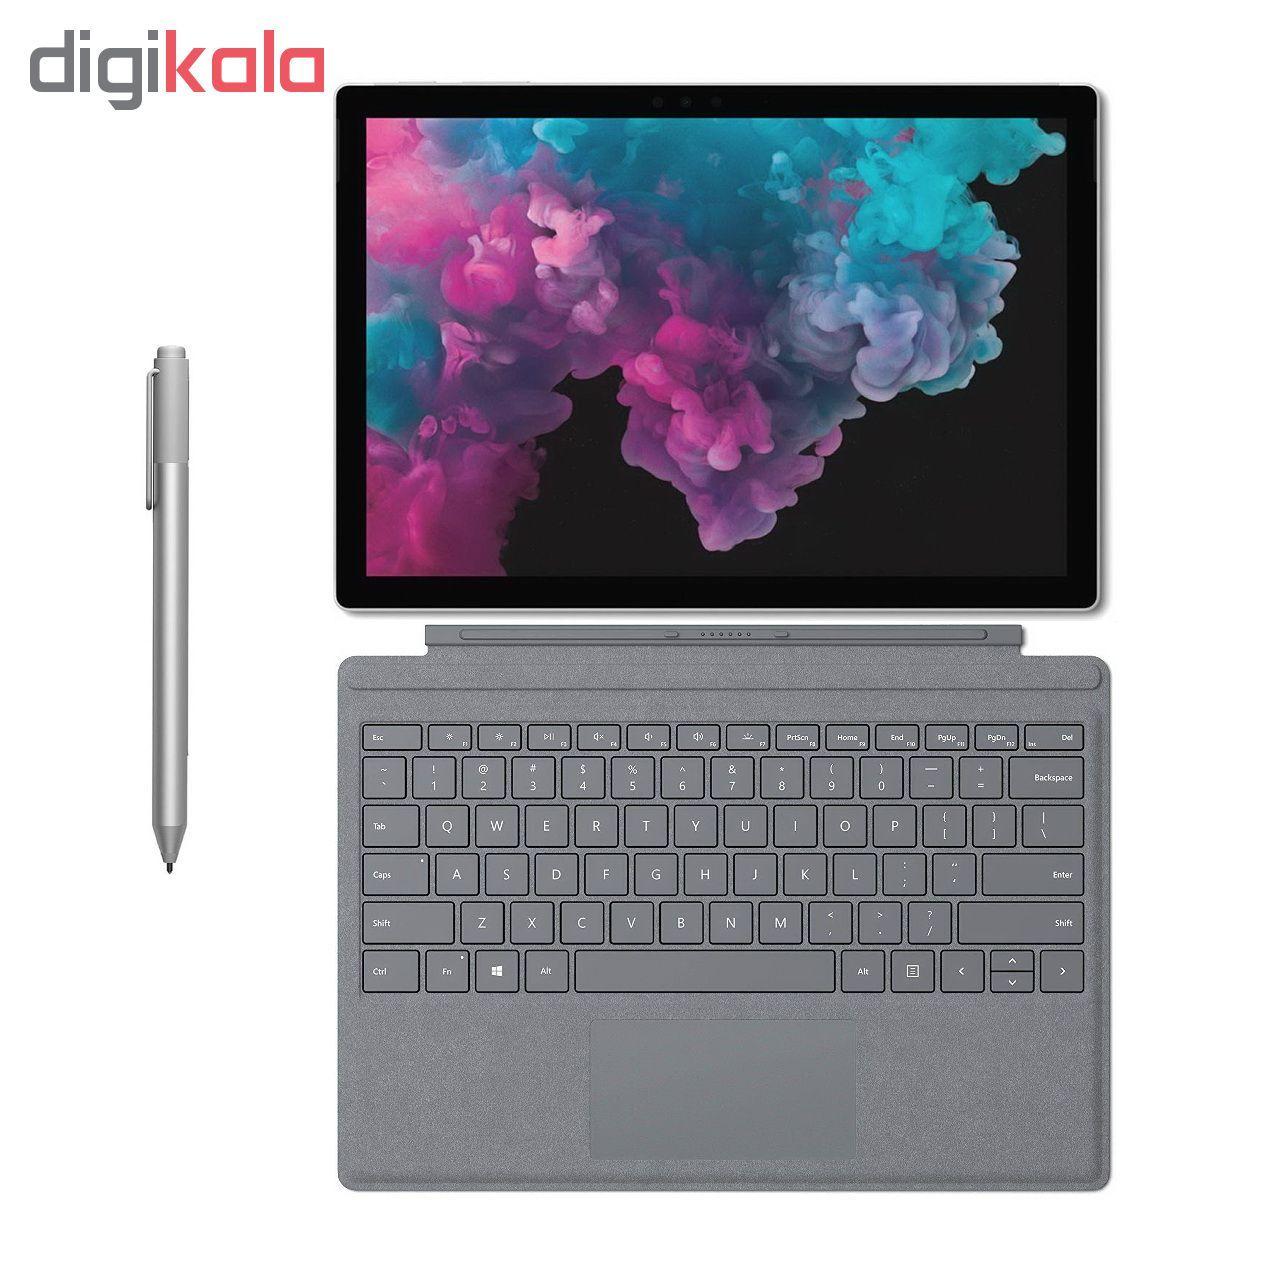 تبلت مایکروسافت مدل Surface Pro 6 - H به همراه کیبورد Signature و قلم main 1 5